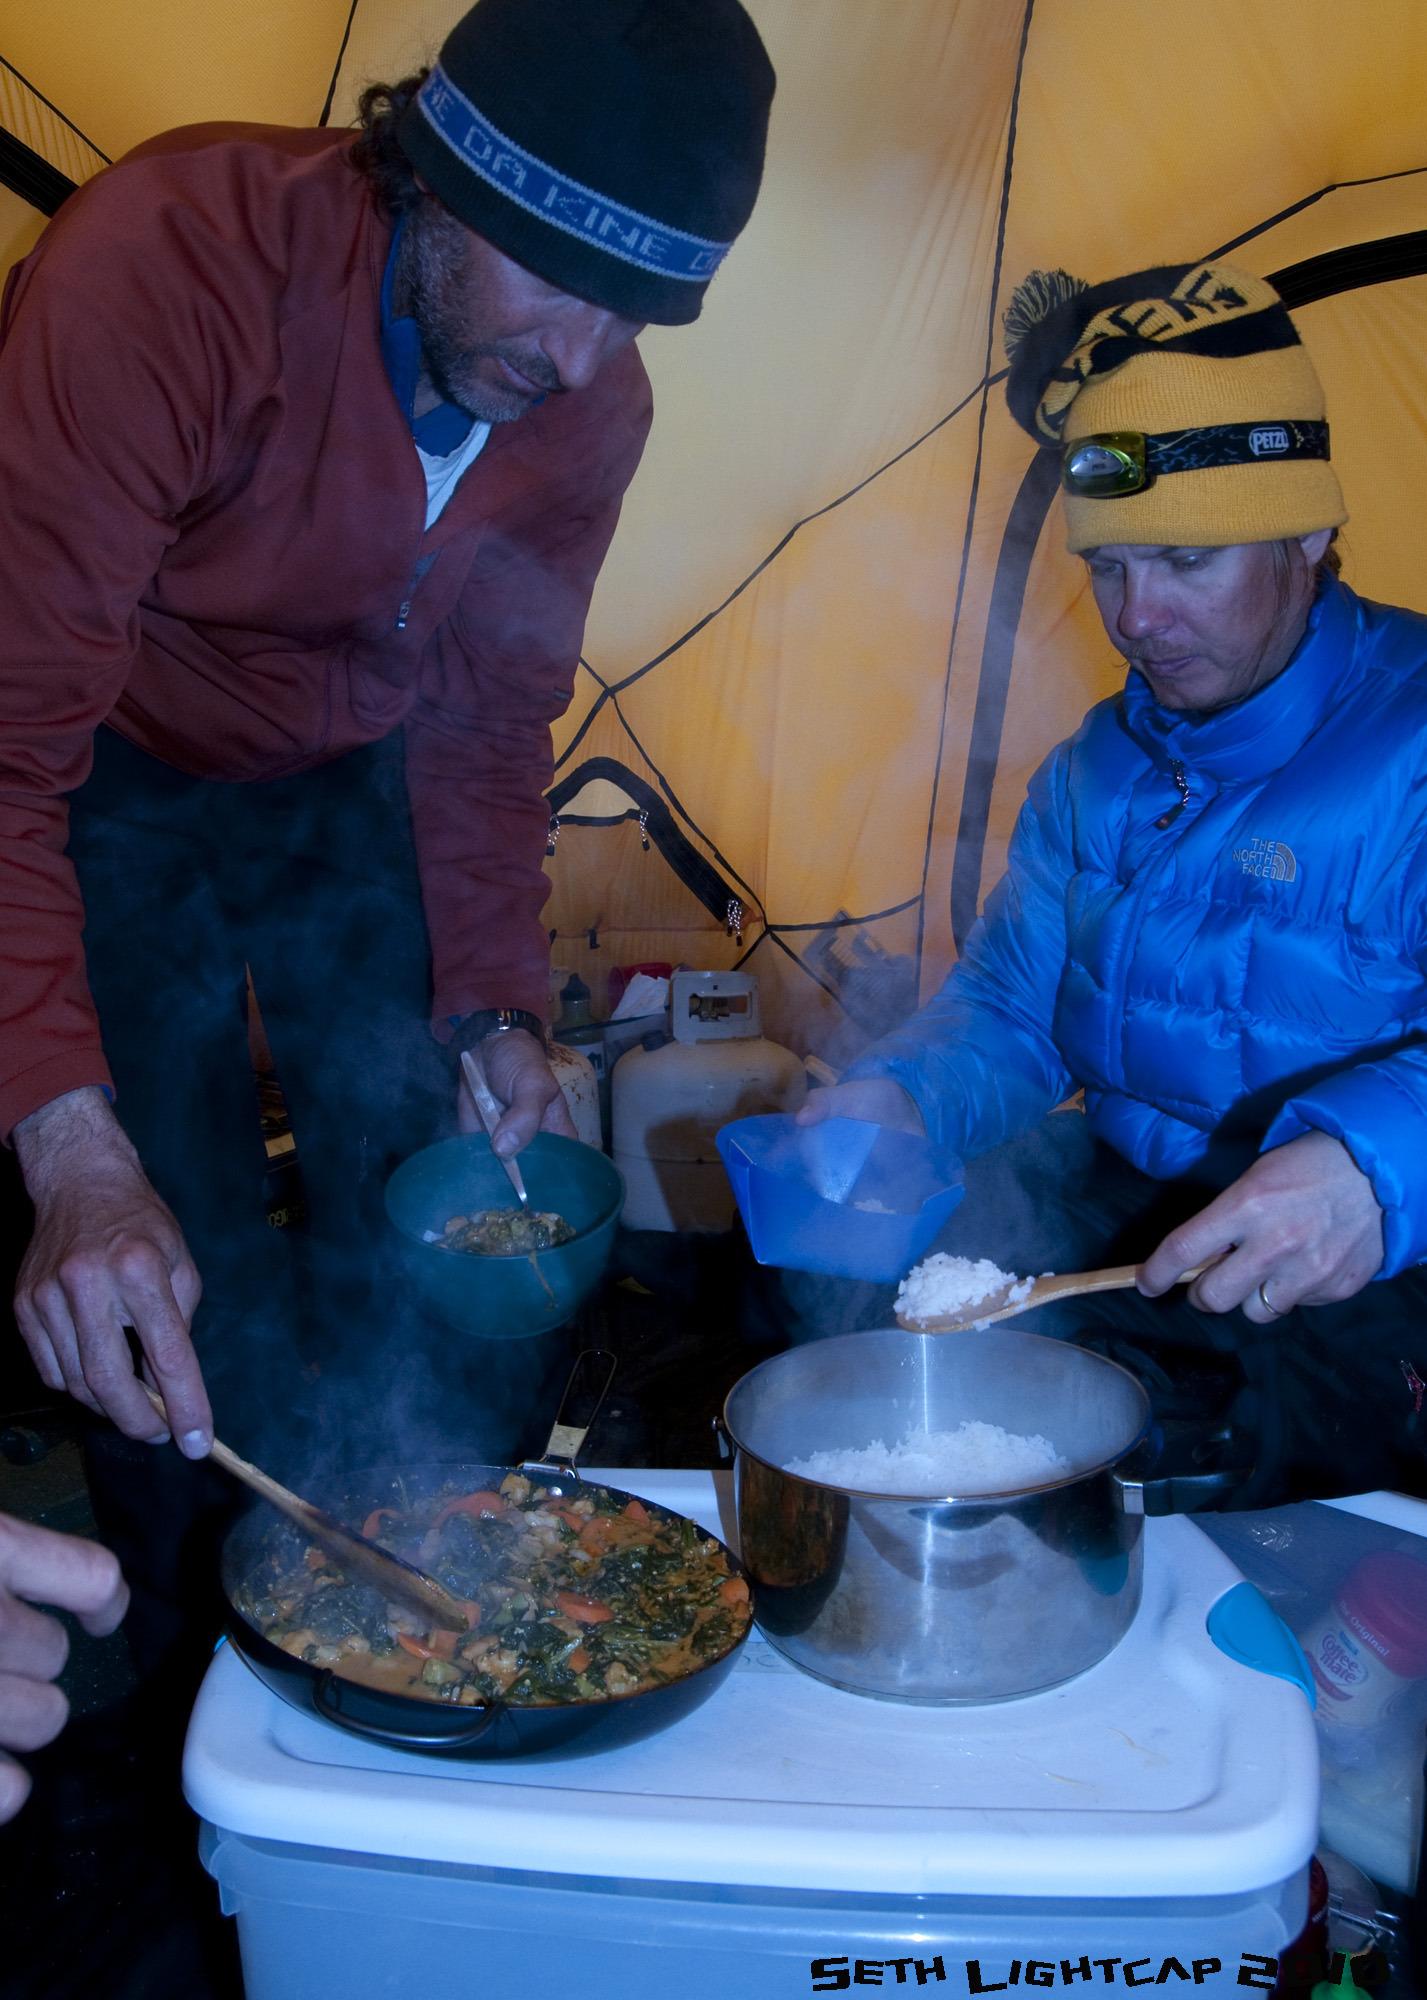 Burt and Repo serve curry